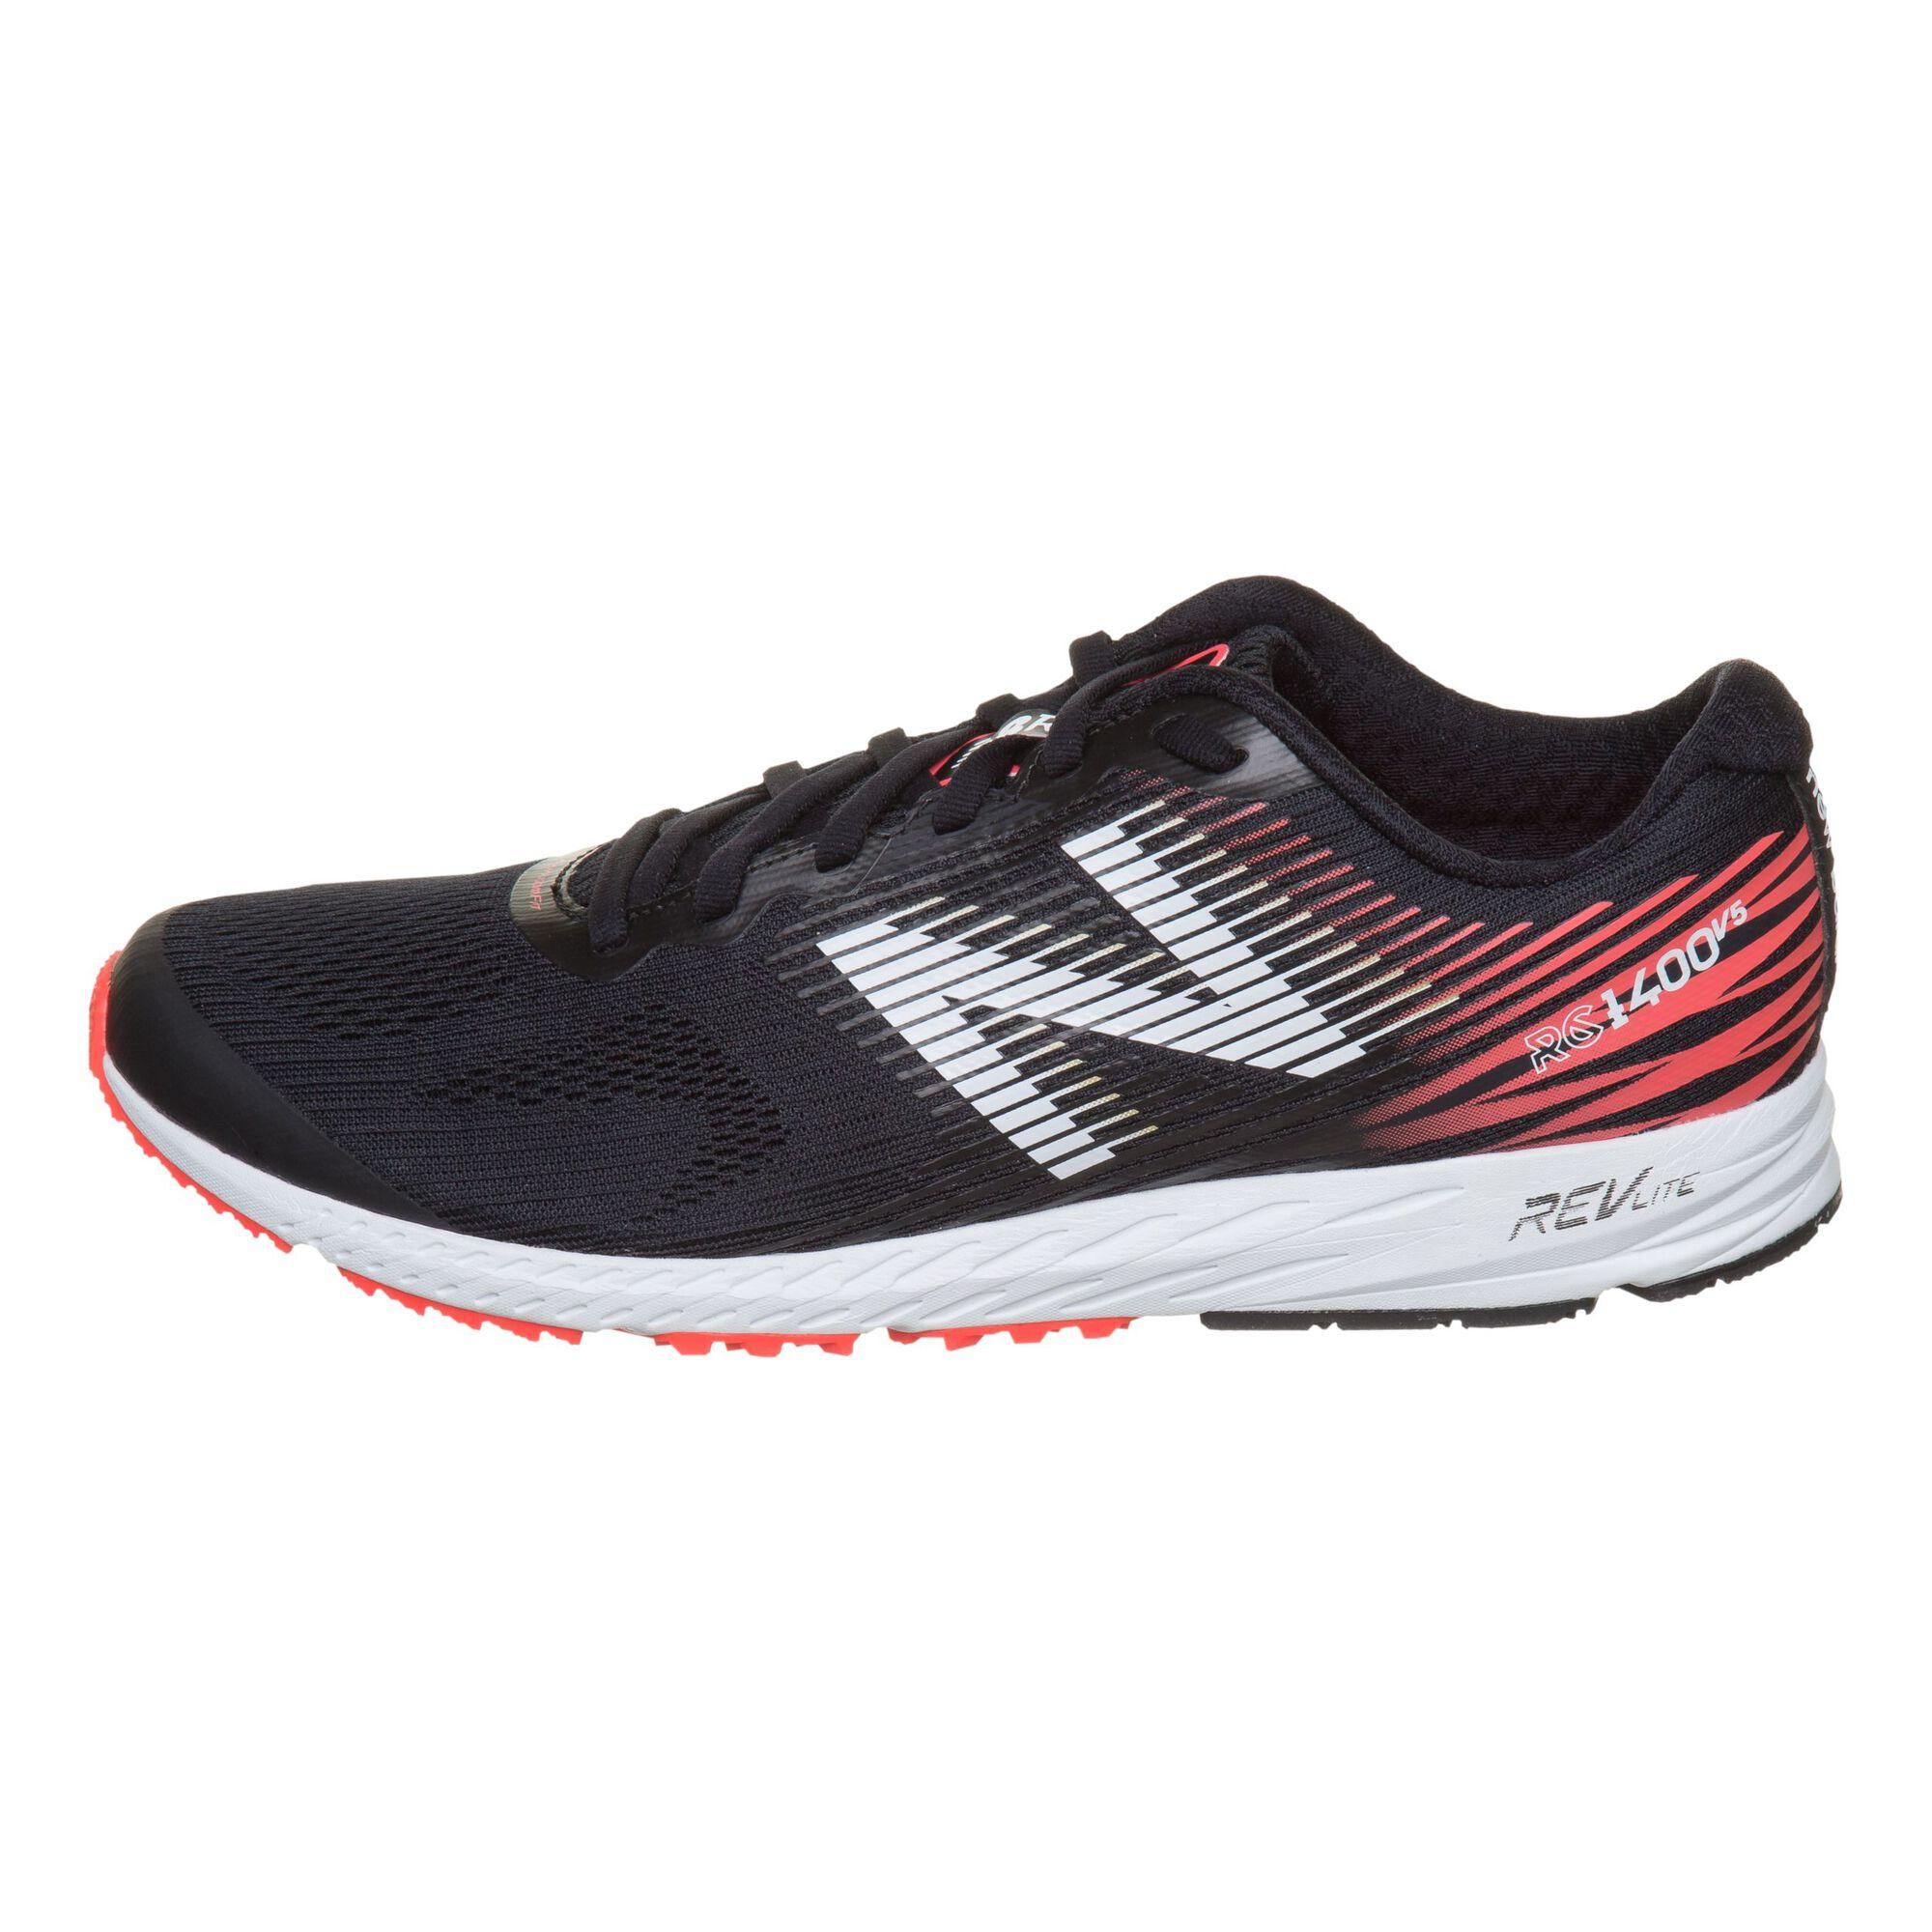 brand new 838f1 e48fd buy New Balance 1400 V5 Competition Running Shoe Men - Black ...